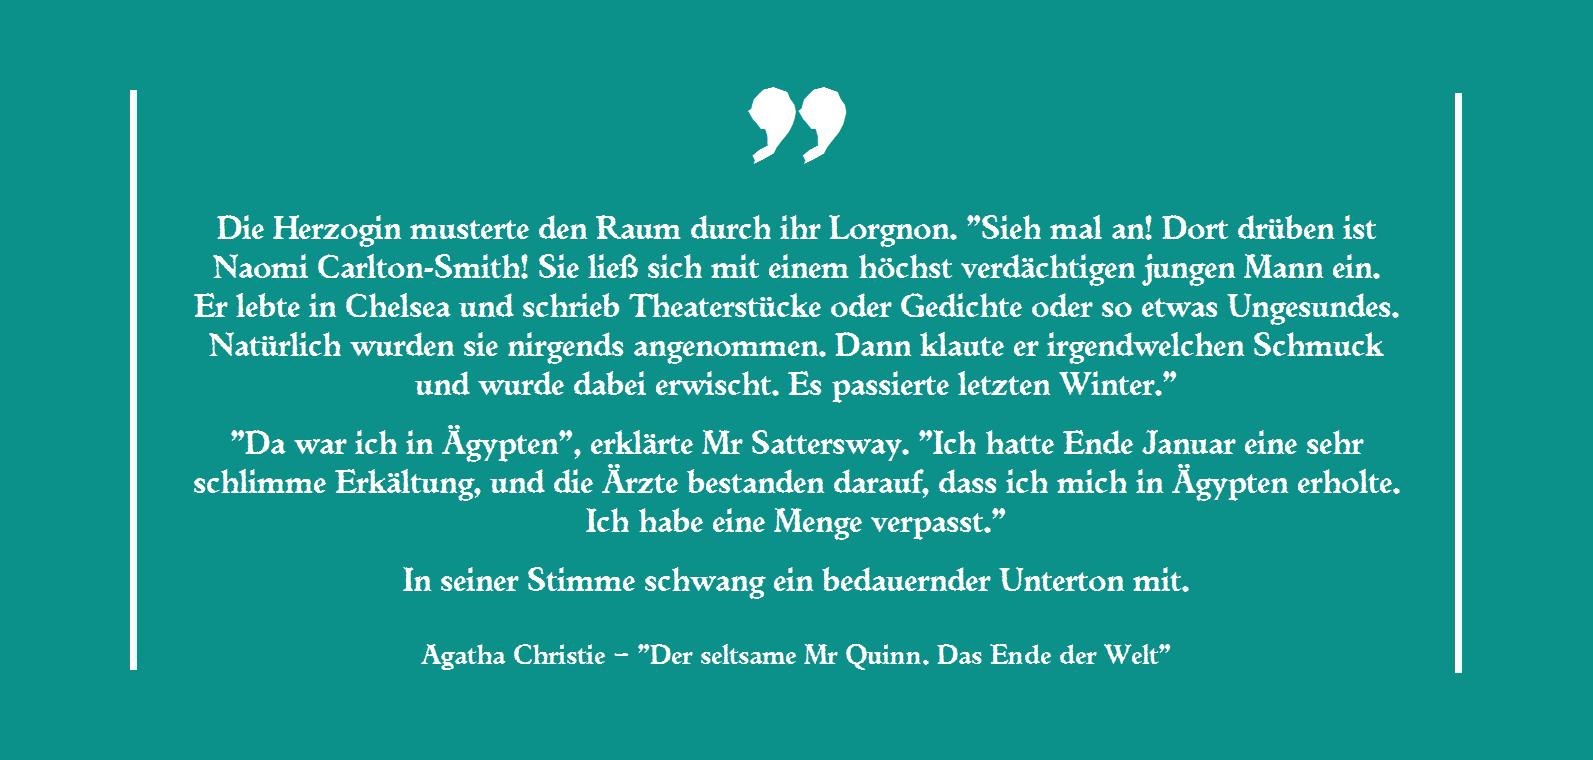 Agatha Christie - Der seltsame Mr Quinn. Das Ende der Welt